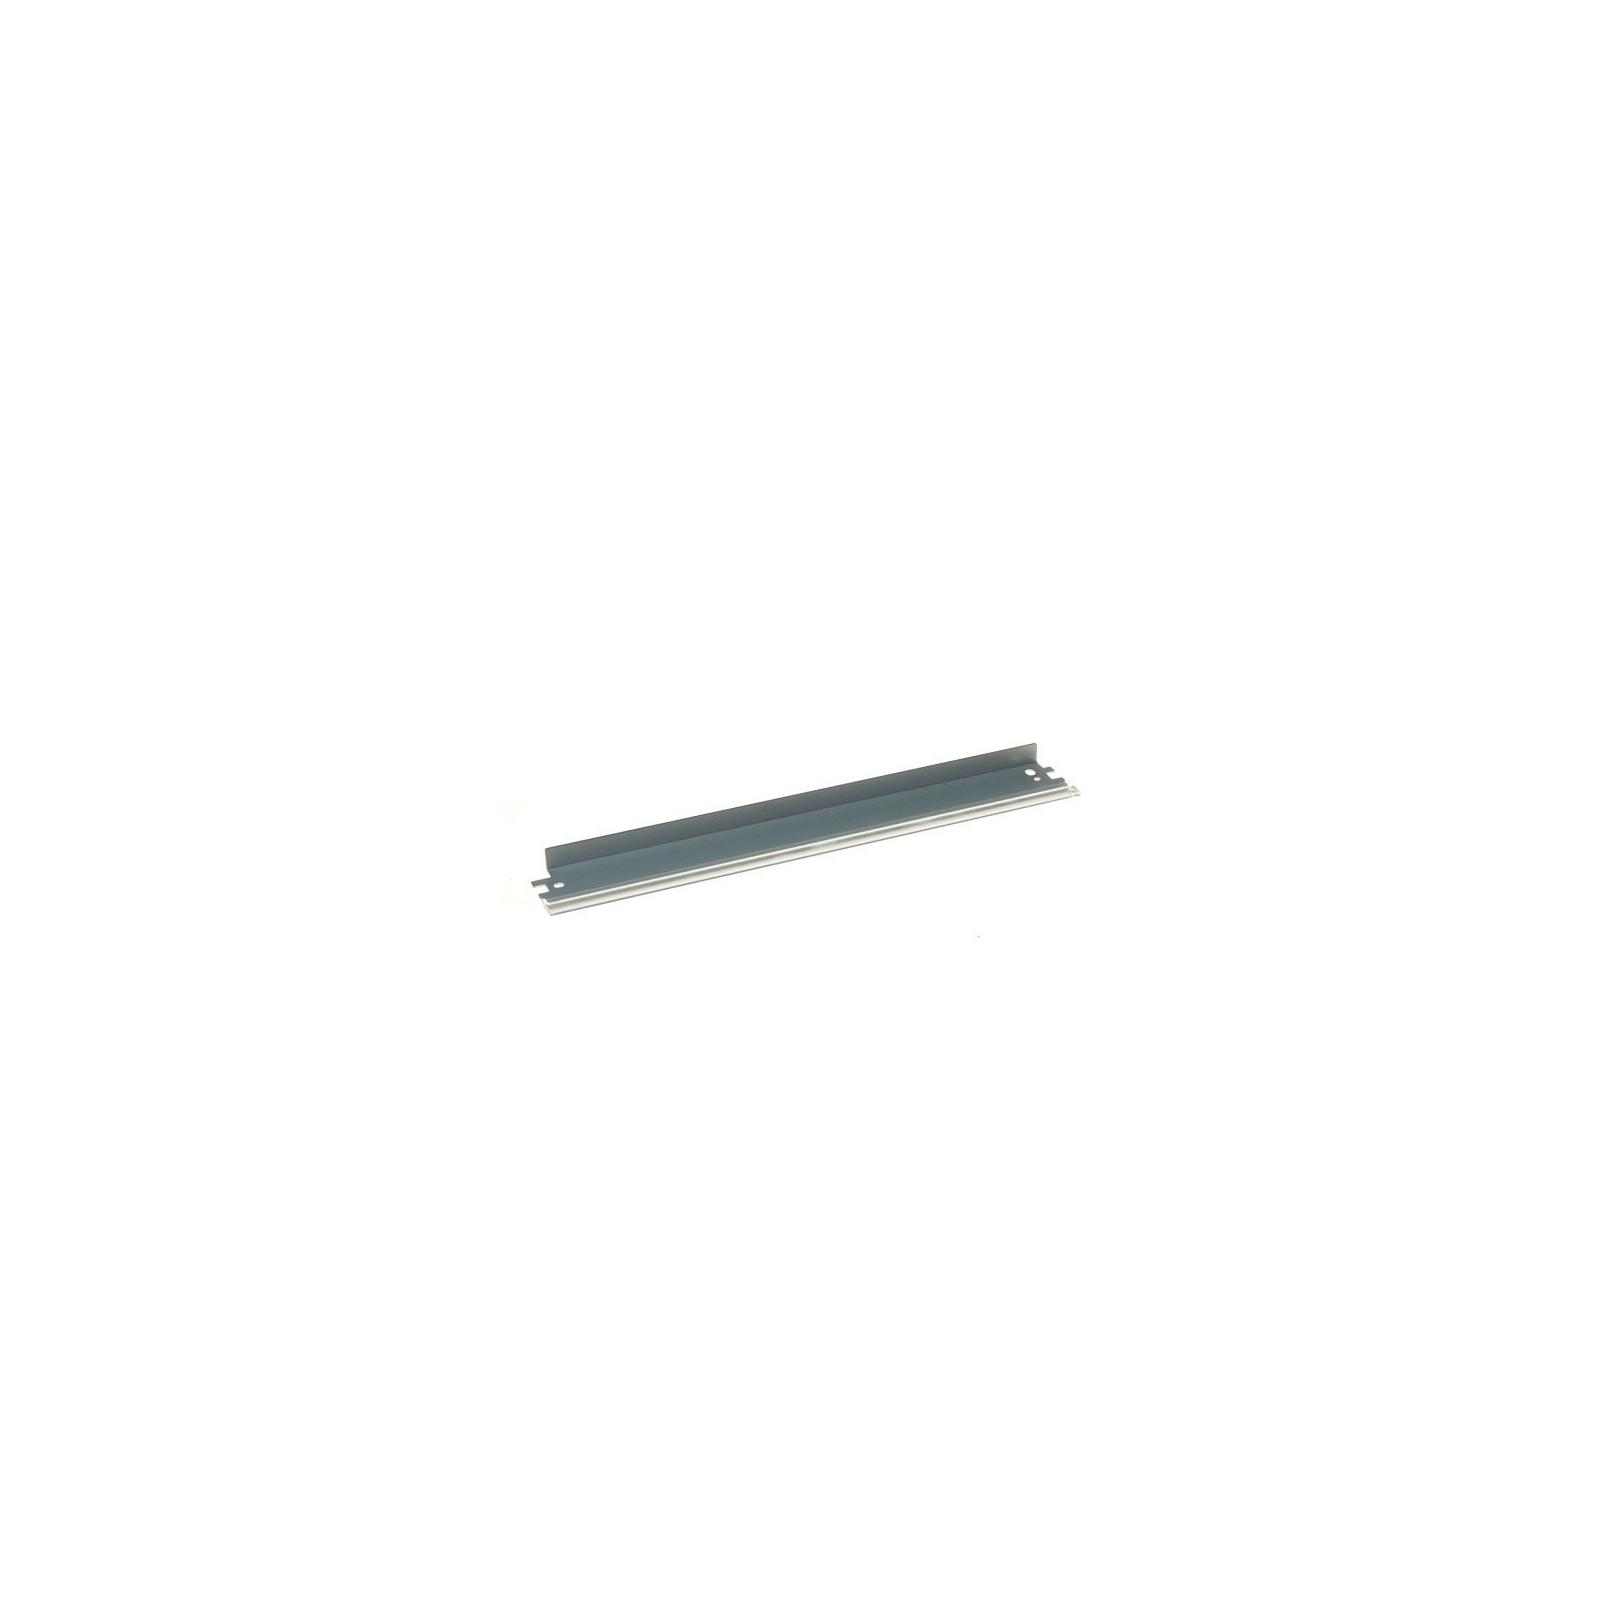 Чистящее лезвие EVERPRINT HP LJ 1010/1012/1015 (WB-HP-1010-EVP)